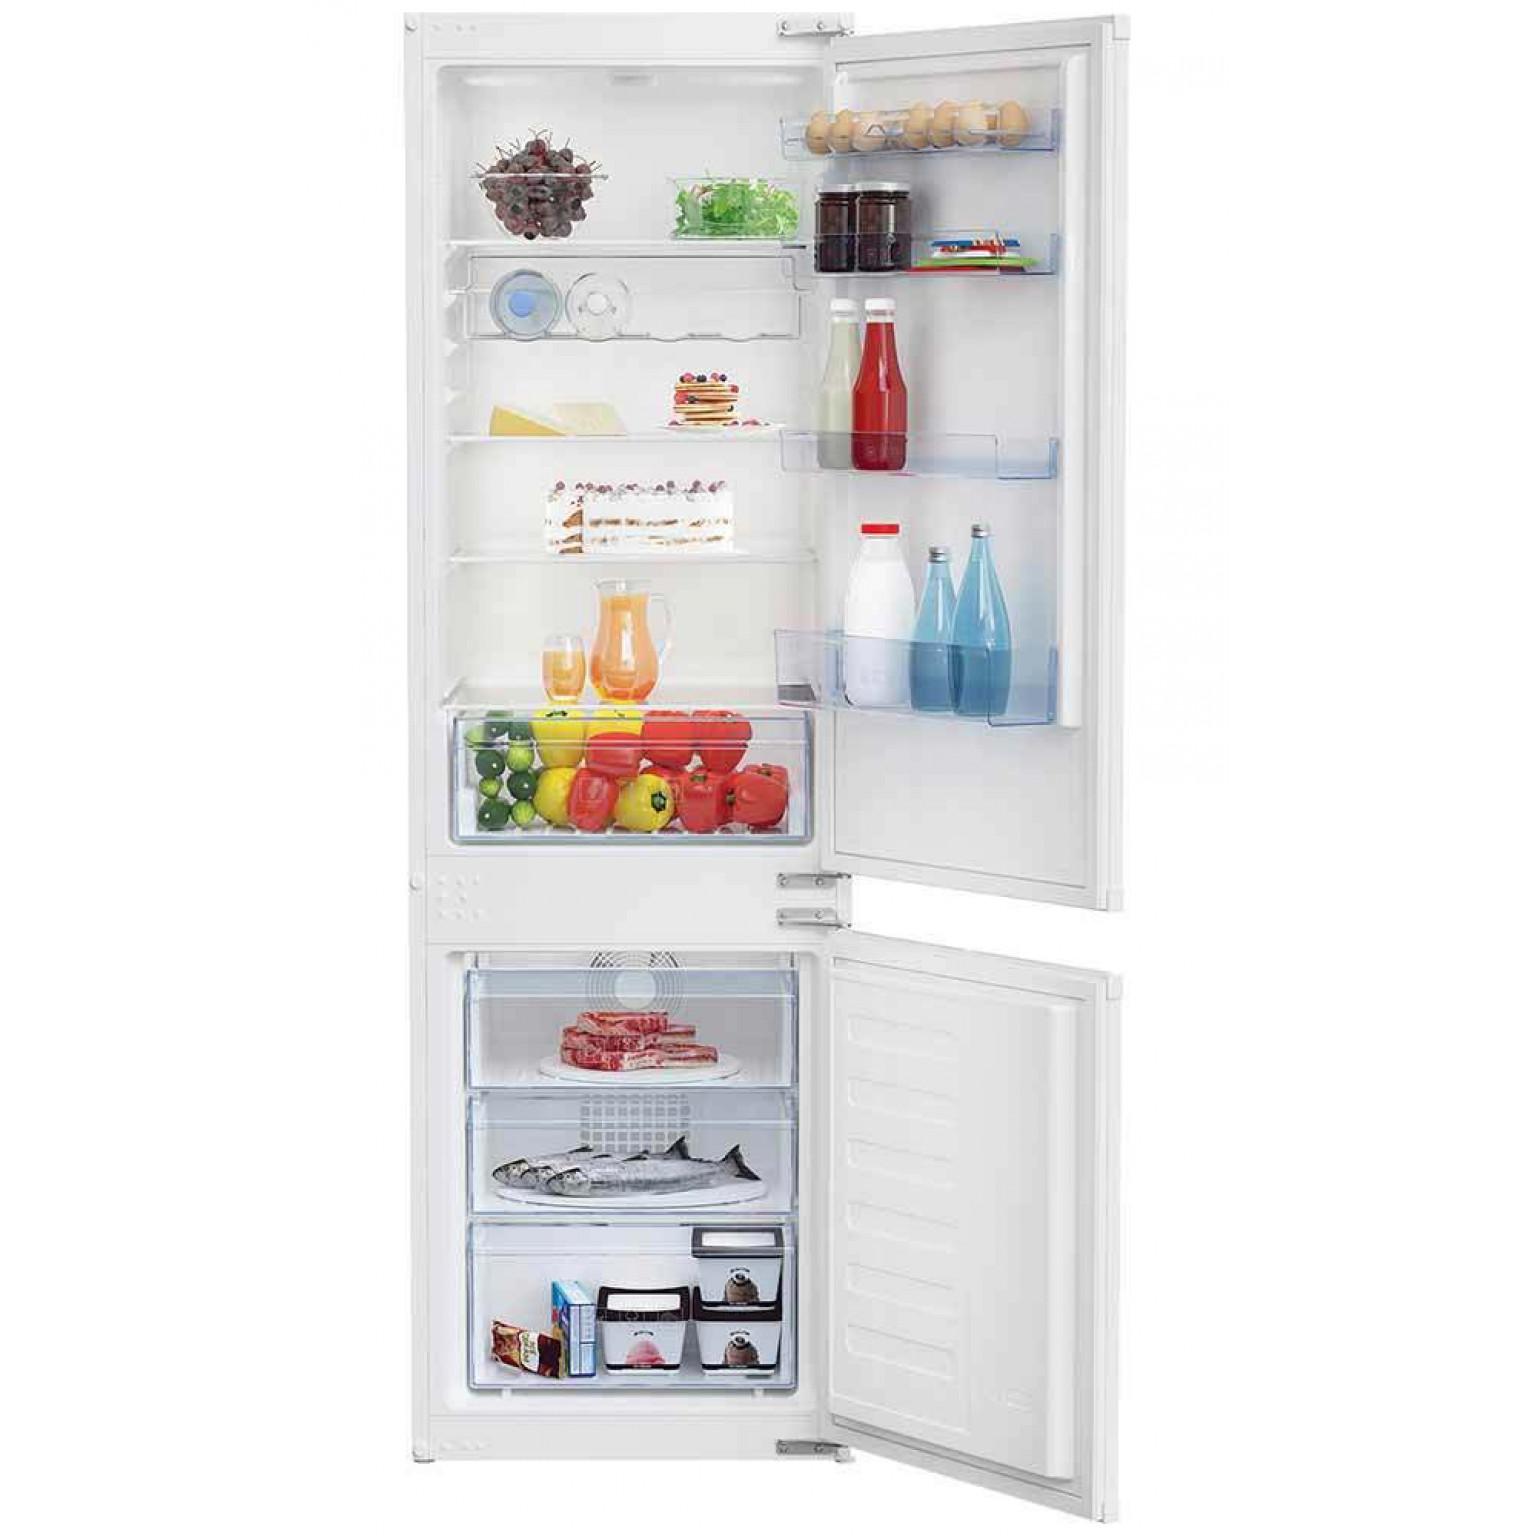 Beko Integrated Frost Free Fridge Freezer   BCFD173